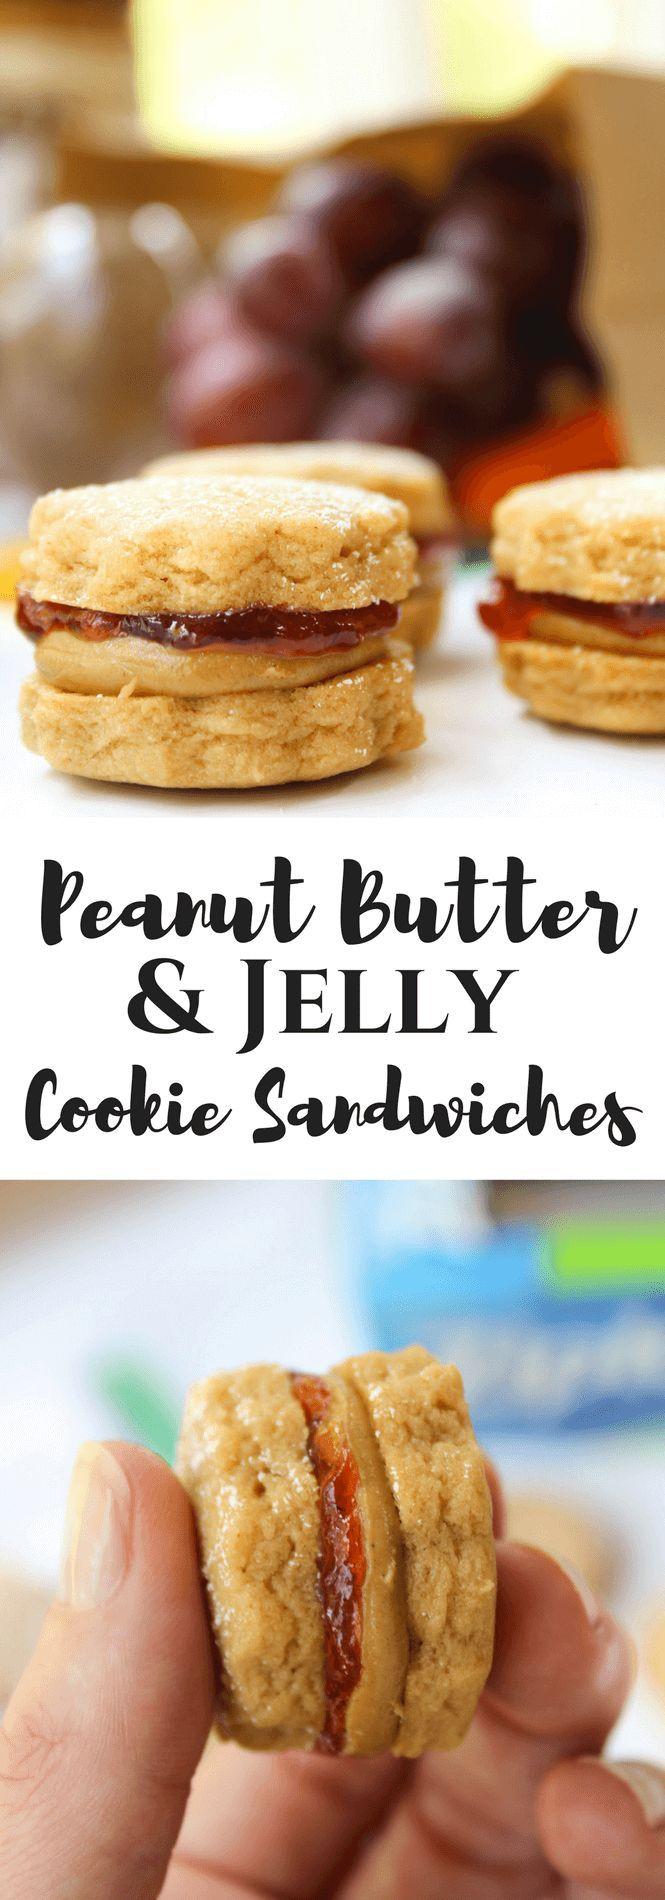 Peanut Butter & Jelly Mini Cookie Sandwiches | #ad #ShopRitePBJLove  #cbias #peanutbuttercookies | @smucker's @jifpeanutbutter